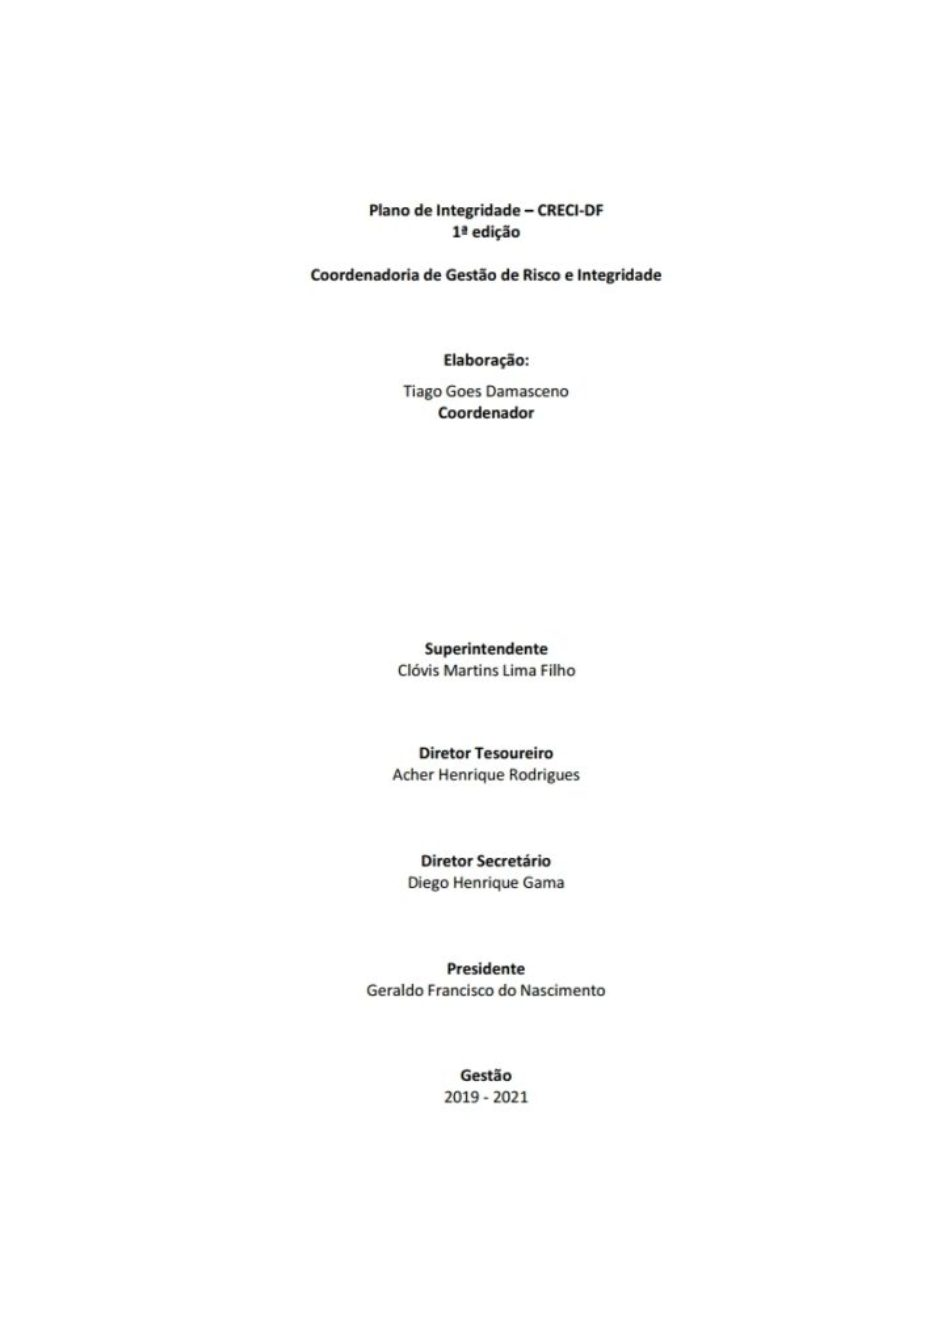 PLANO DE INTEGRIDADE.pdf_page_03